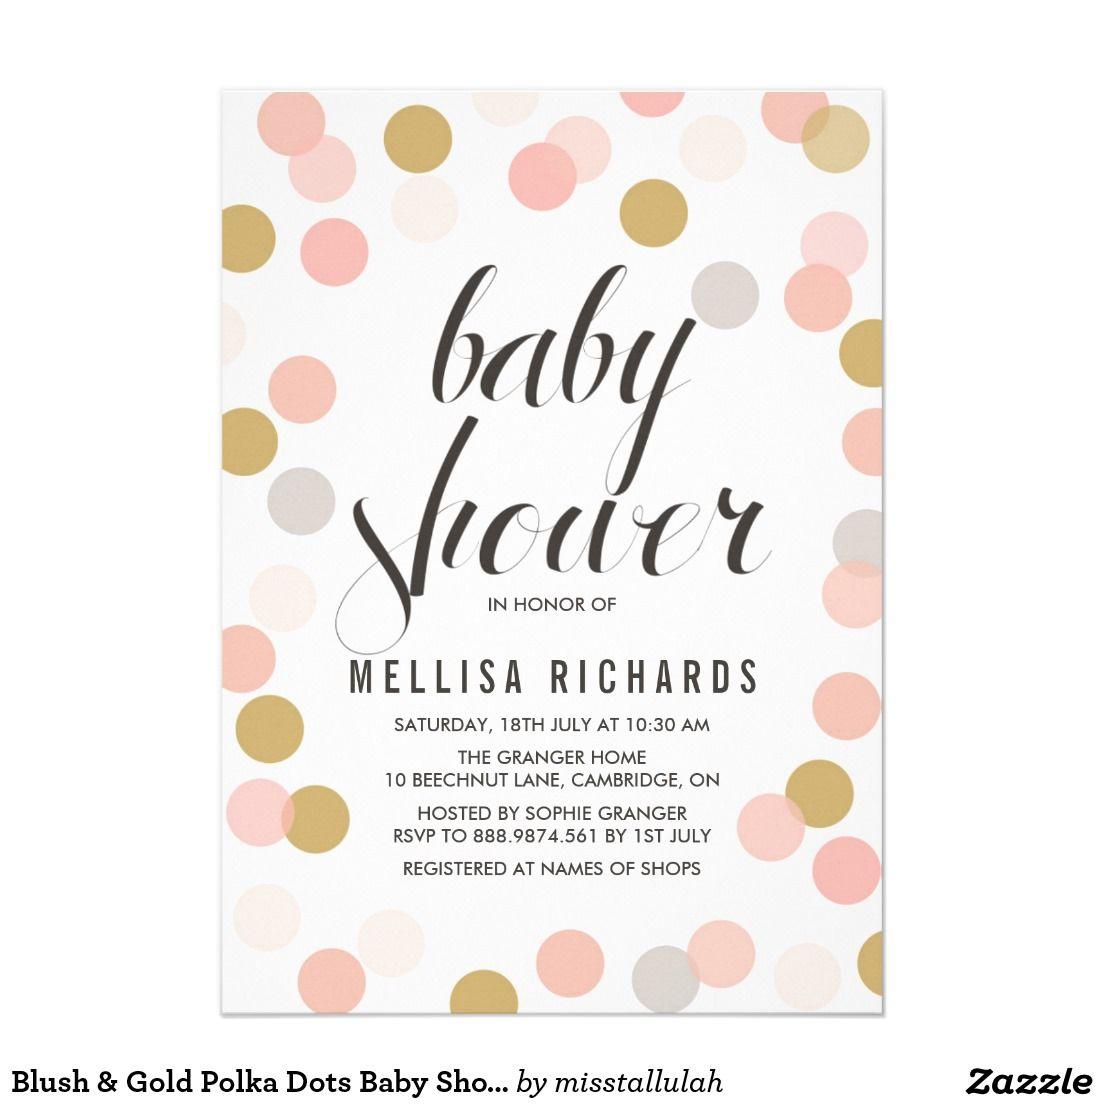 Blush & Gold Polka Dots Baby Shower Invitation | Shower invitations